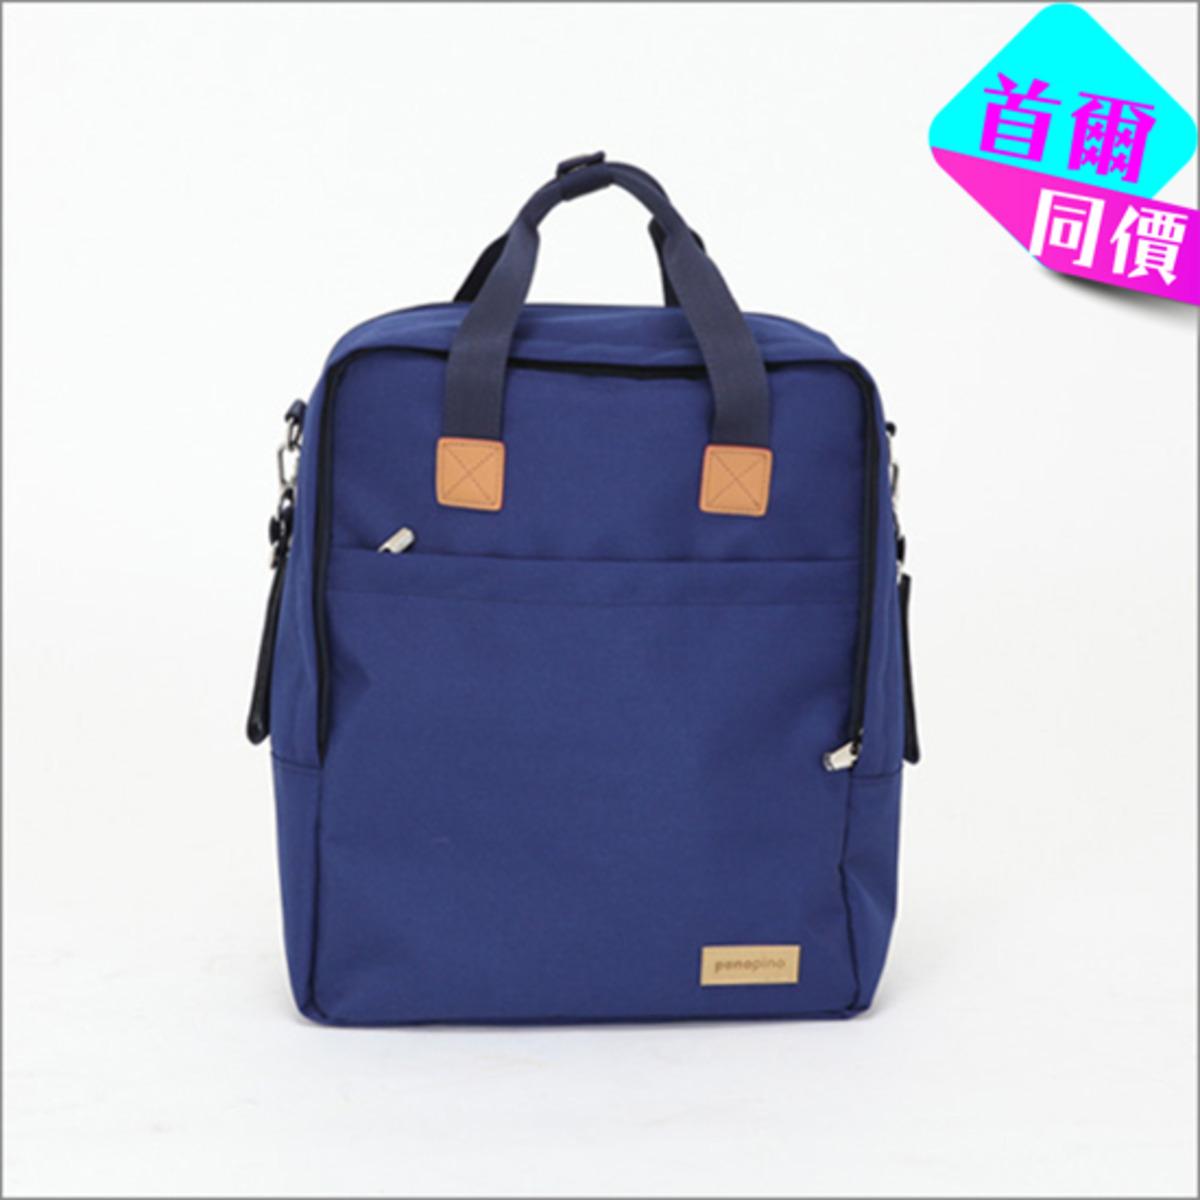 Ponopino經典款背囊 (海軍藍)_Classic2